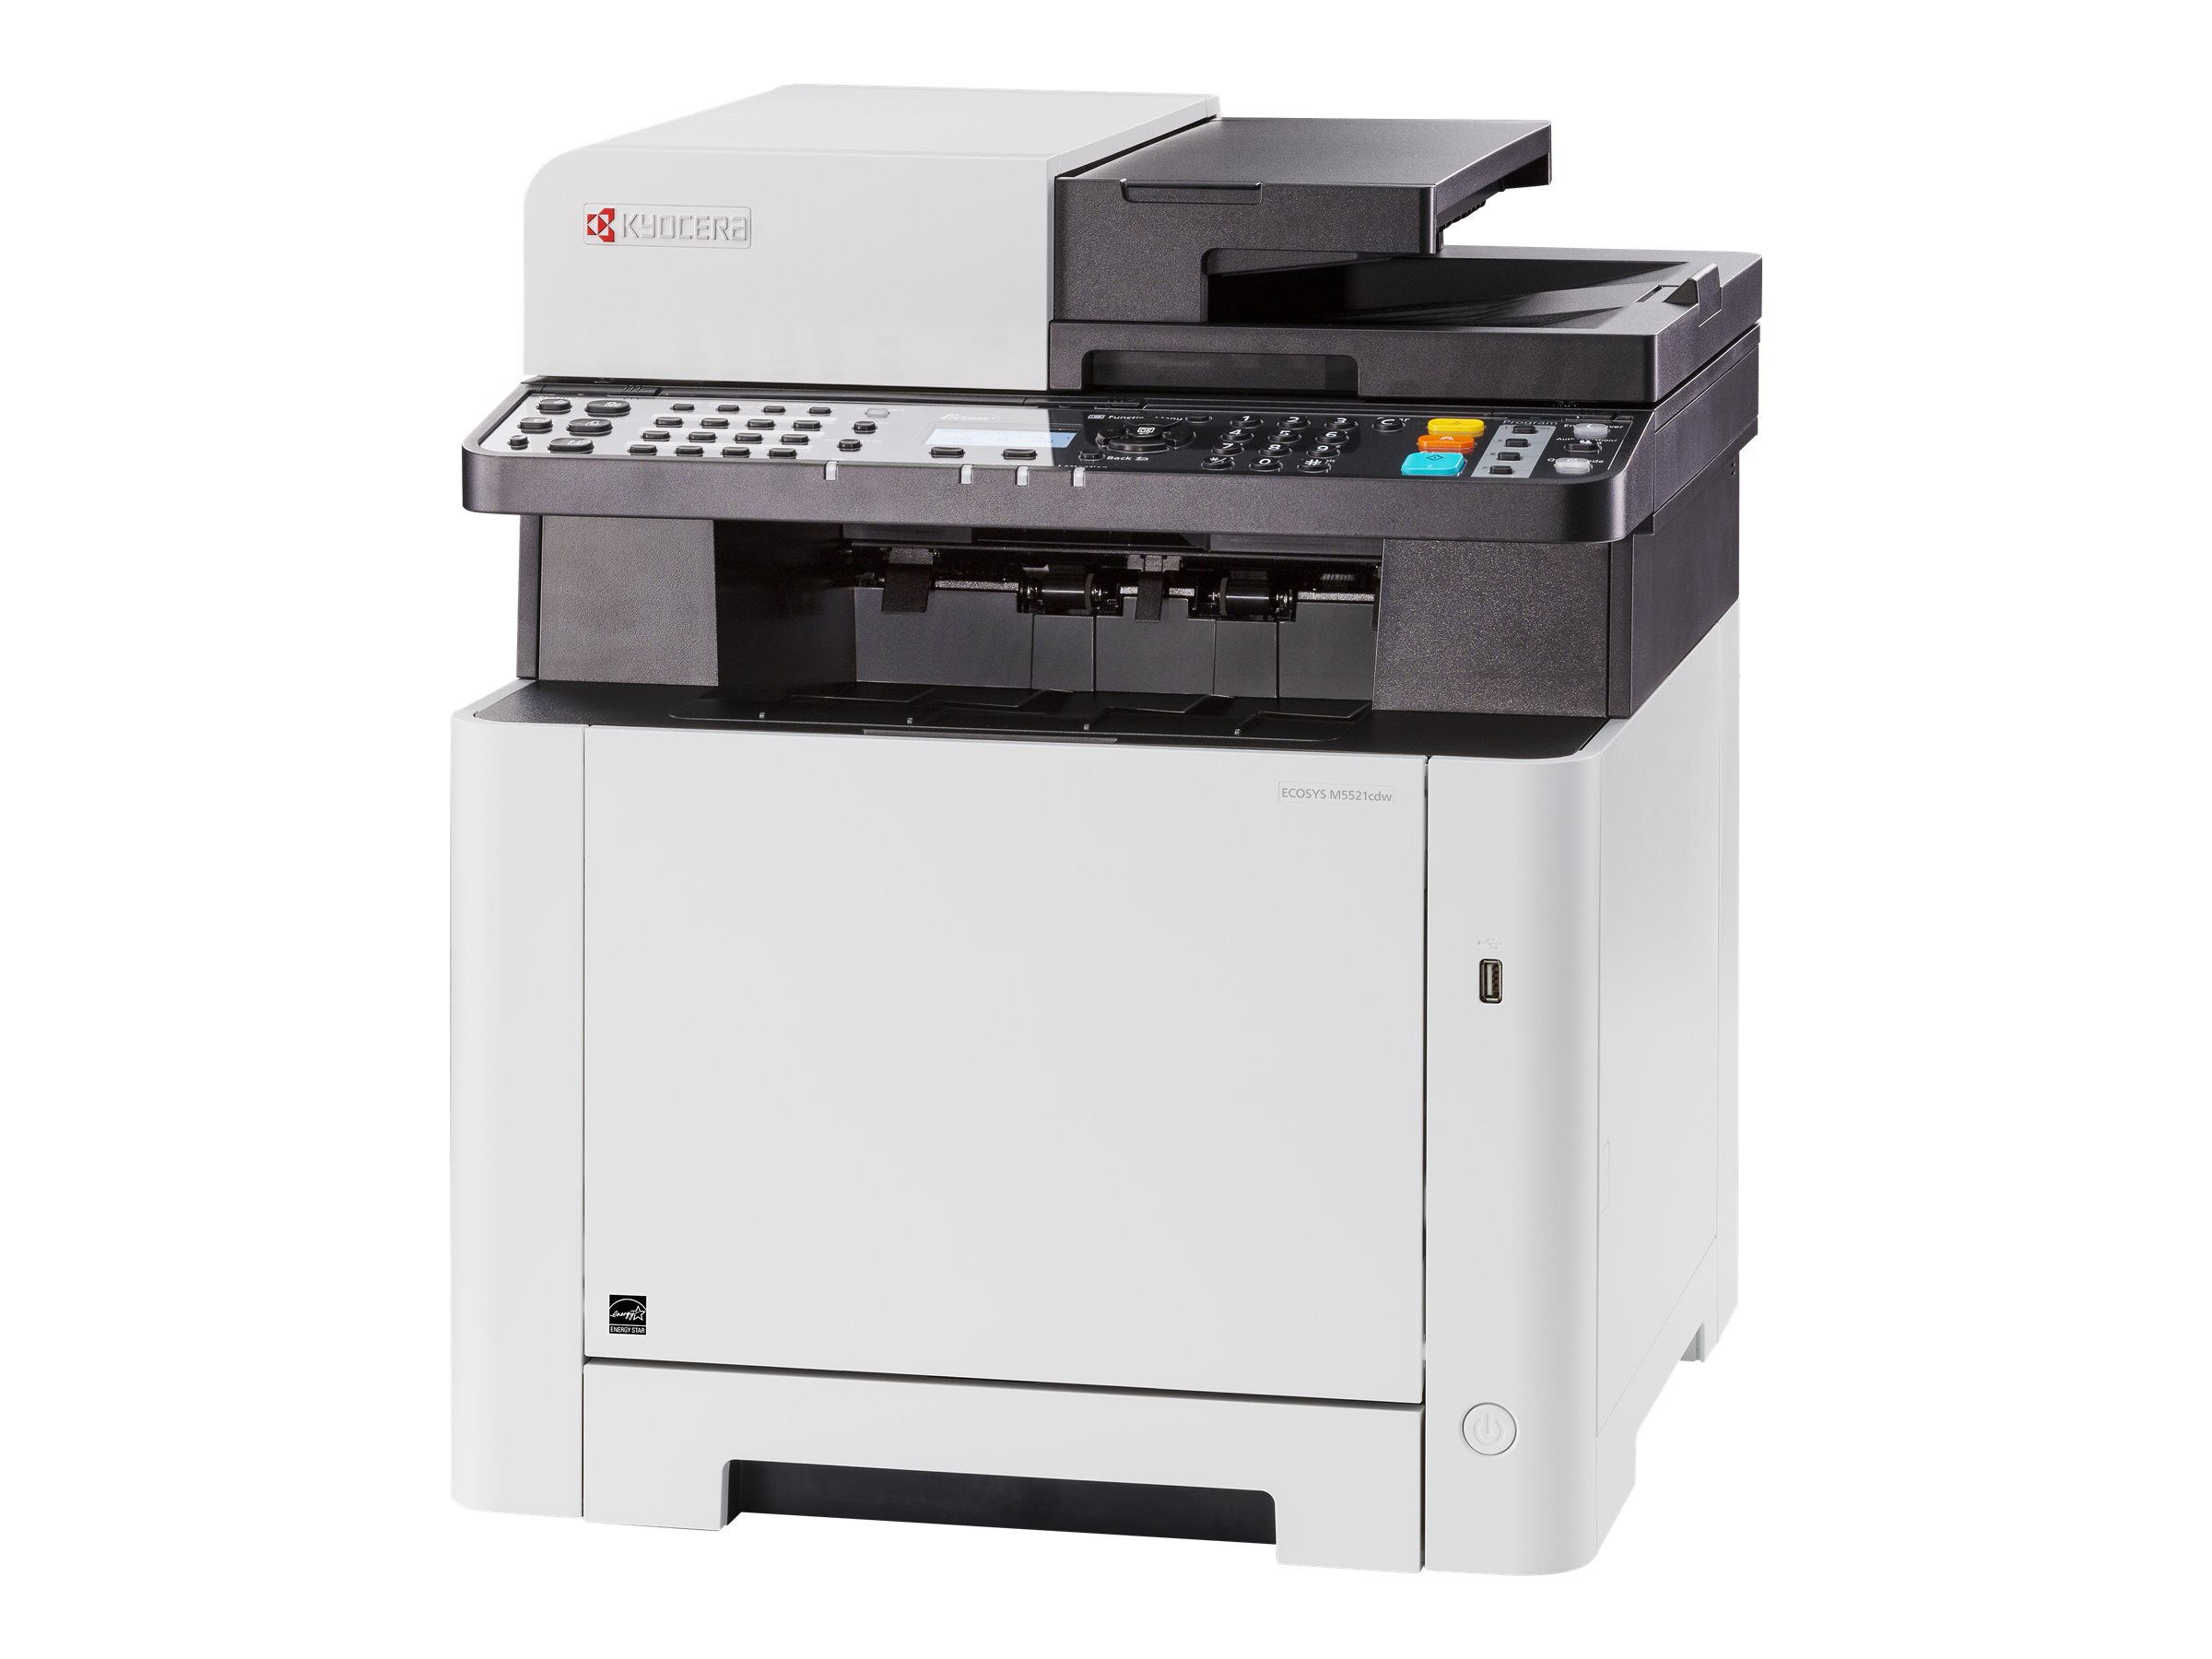 Kyocera ECOSYS M5521cdw/KL3 - Multifunktionsdrucker - Farbe - Laser - Legal (216 x 356 mm)/